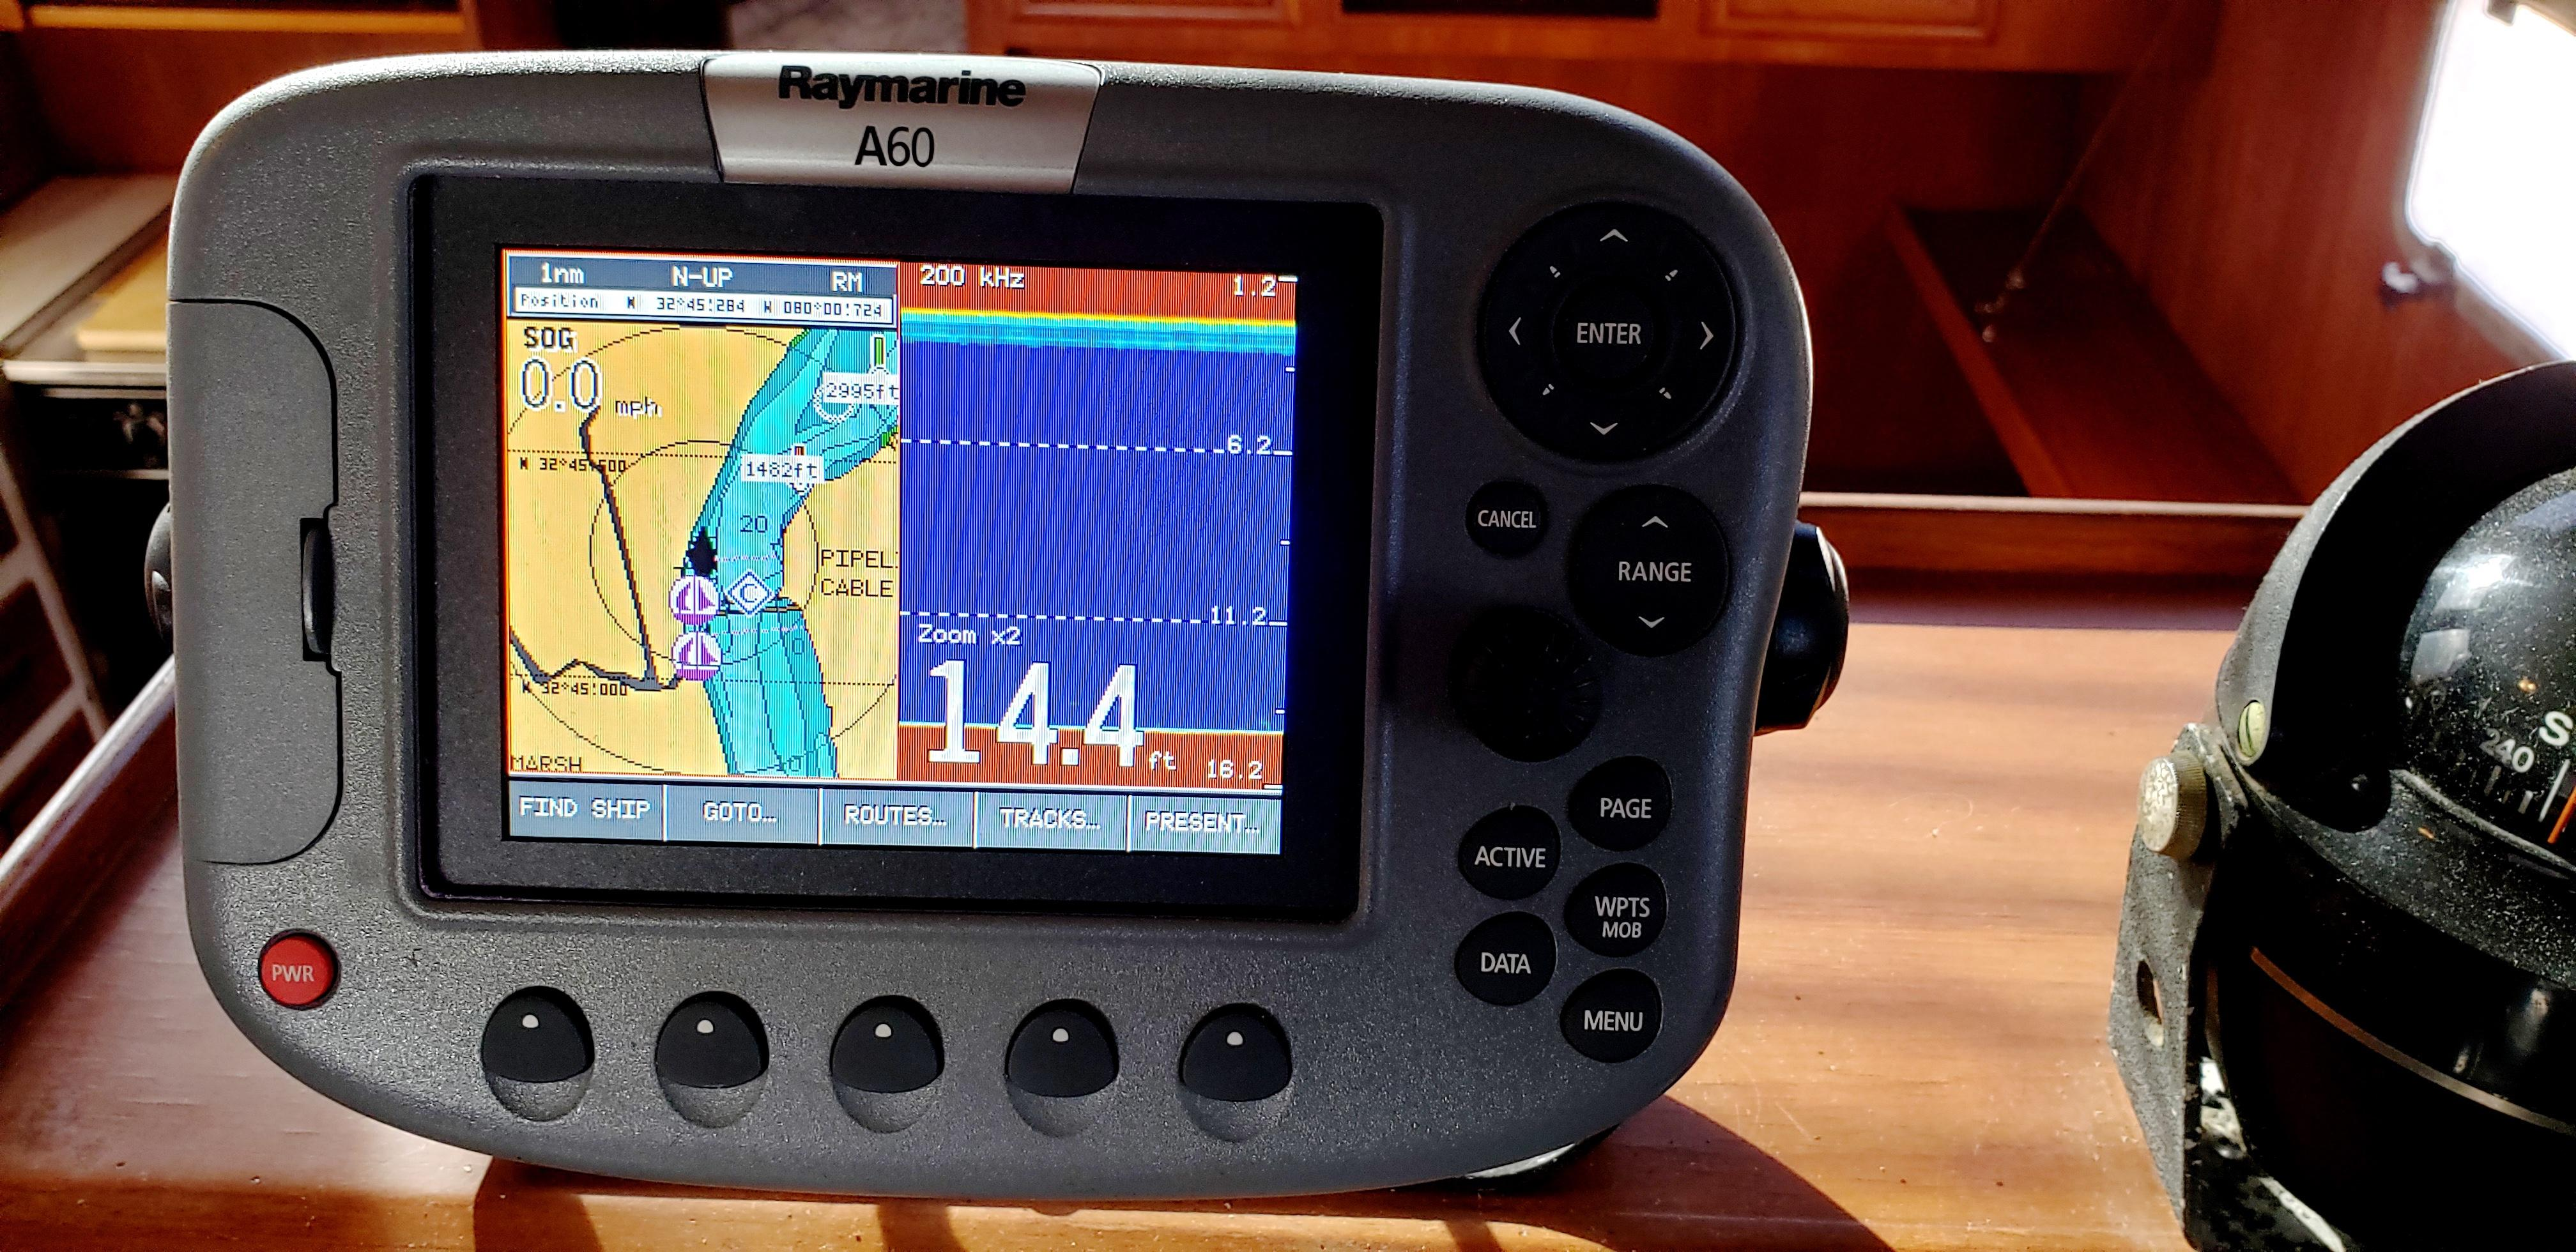 Marine Trader 43 LaBelle Trawler - Raymarine A60 plotter